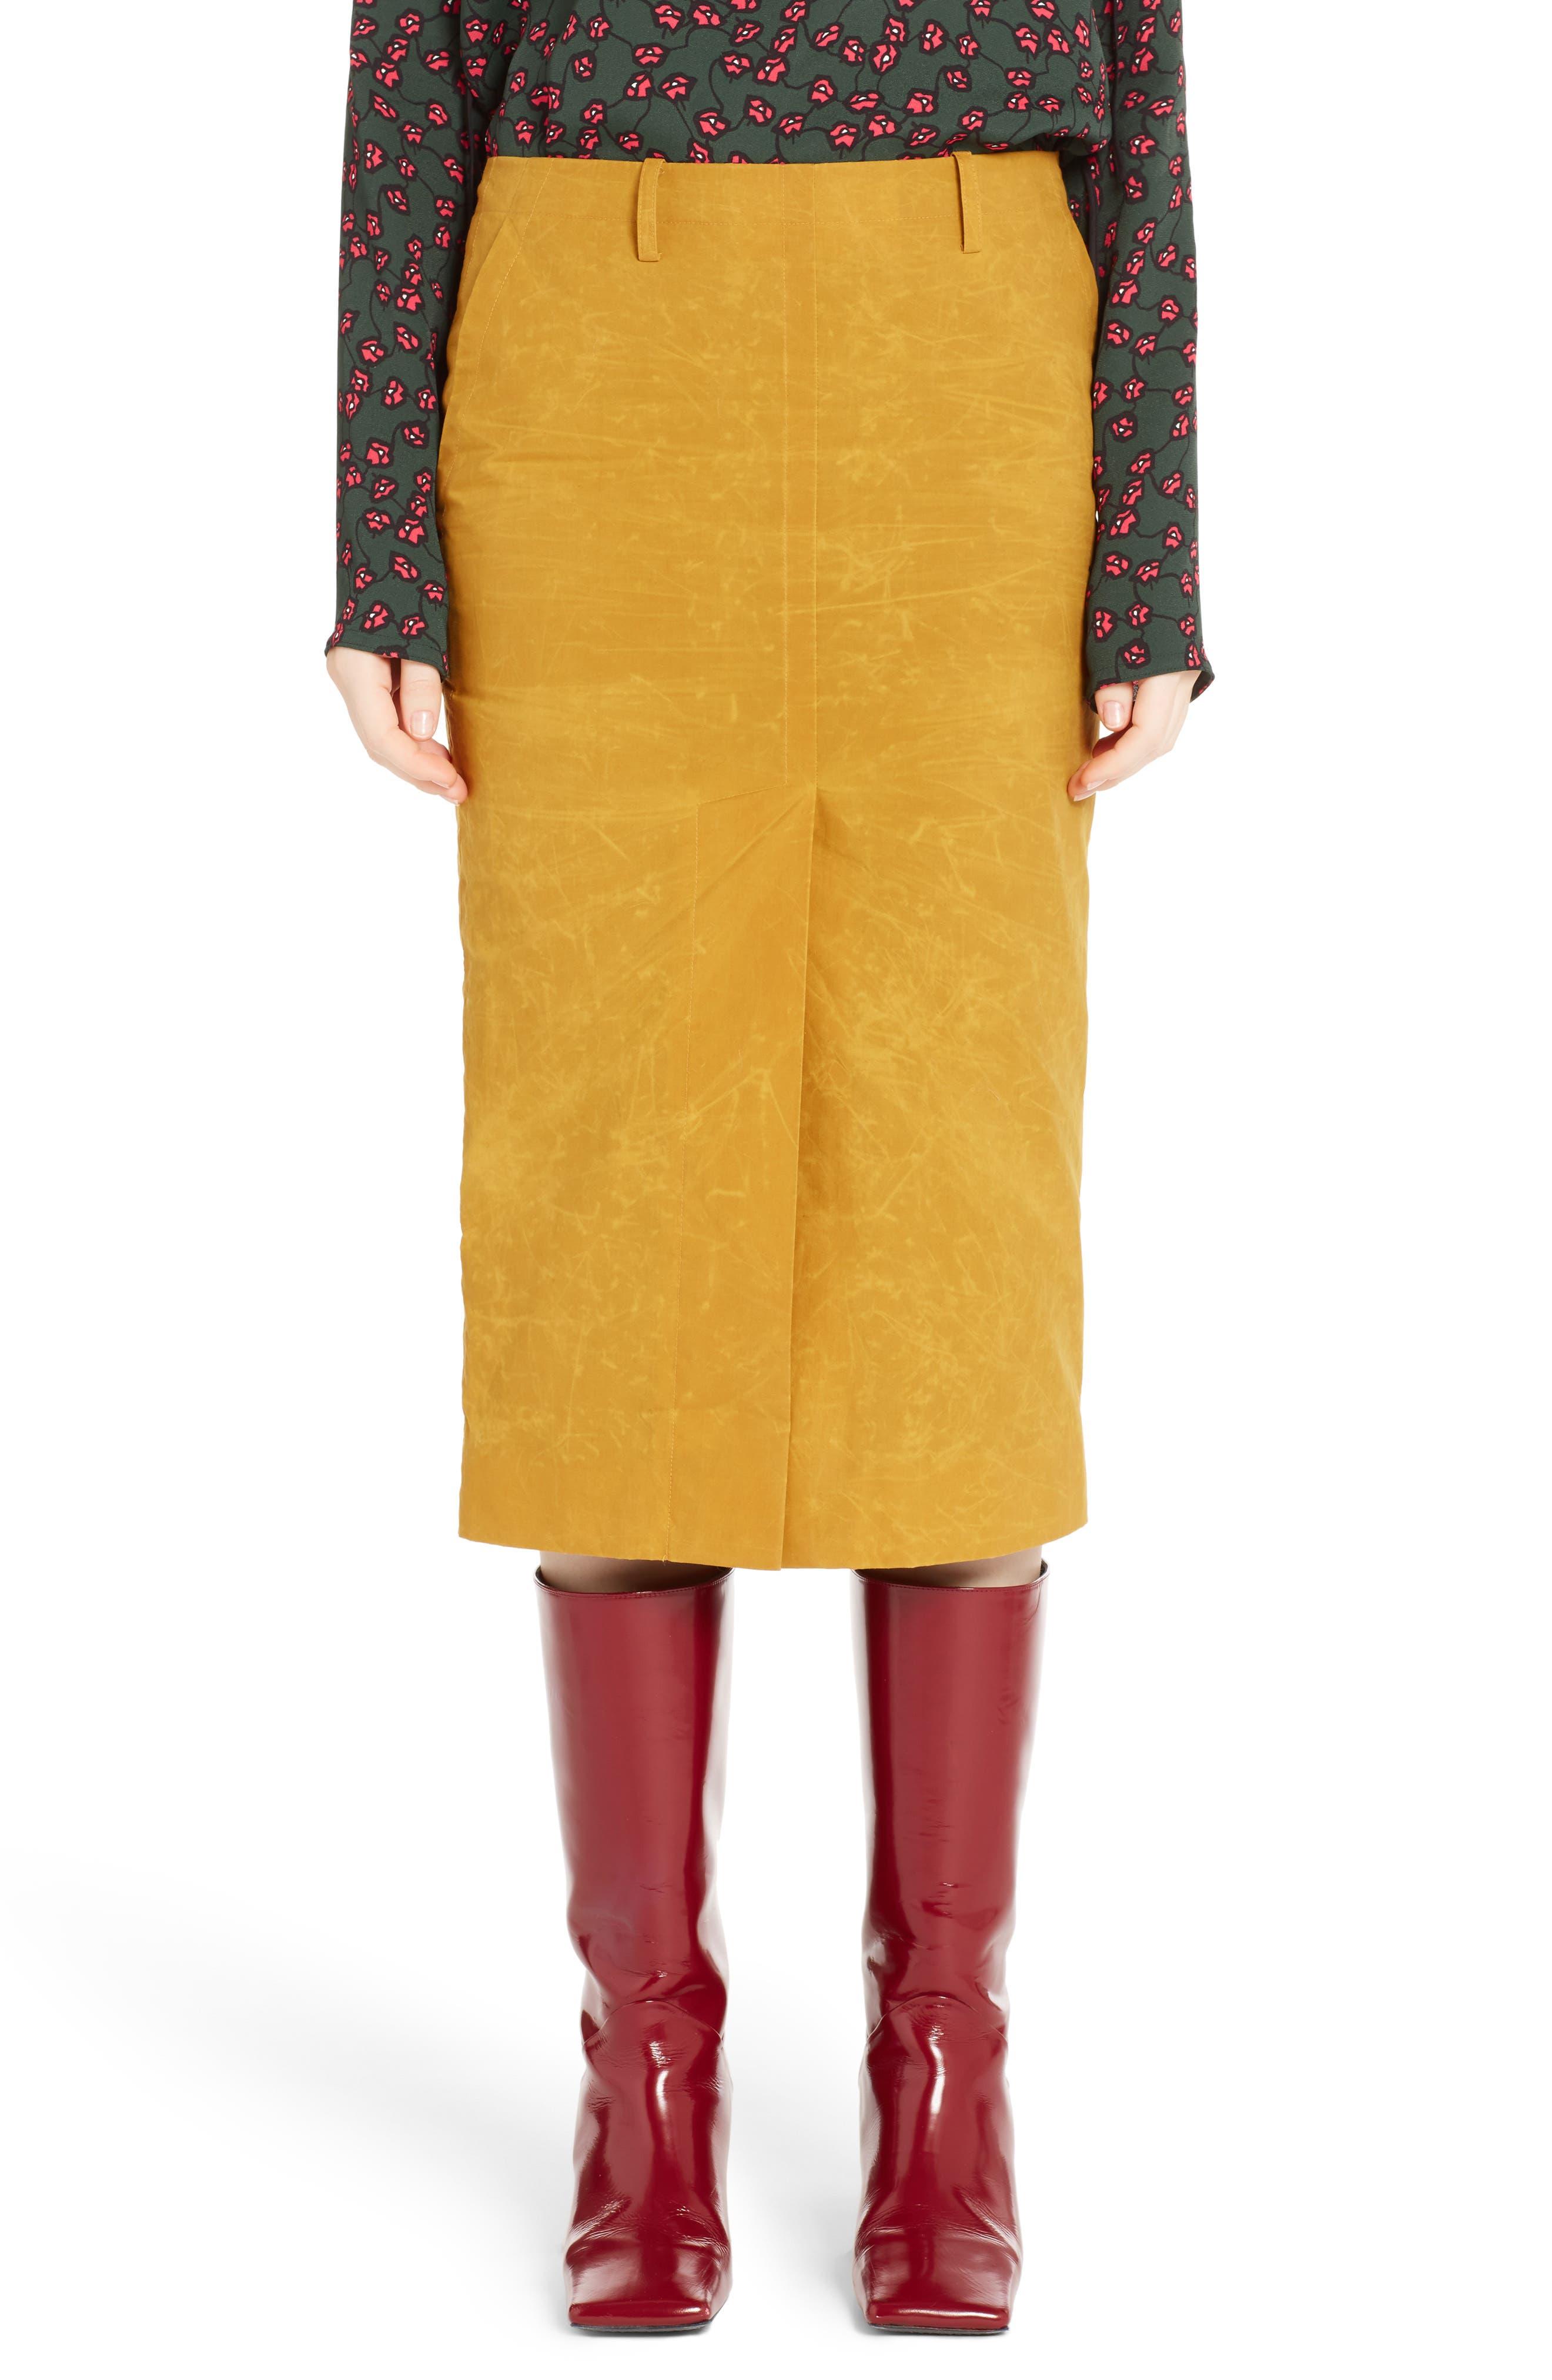 Marni Waxed Cotton Pencil Skirt